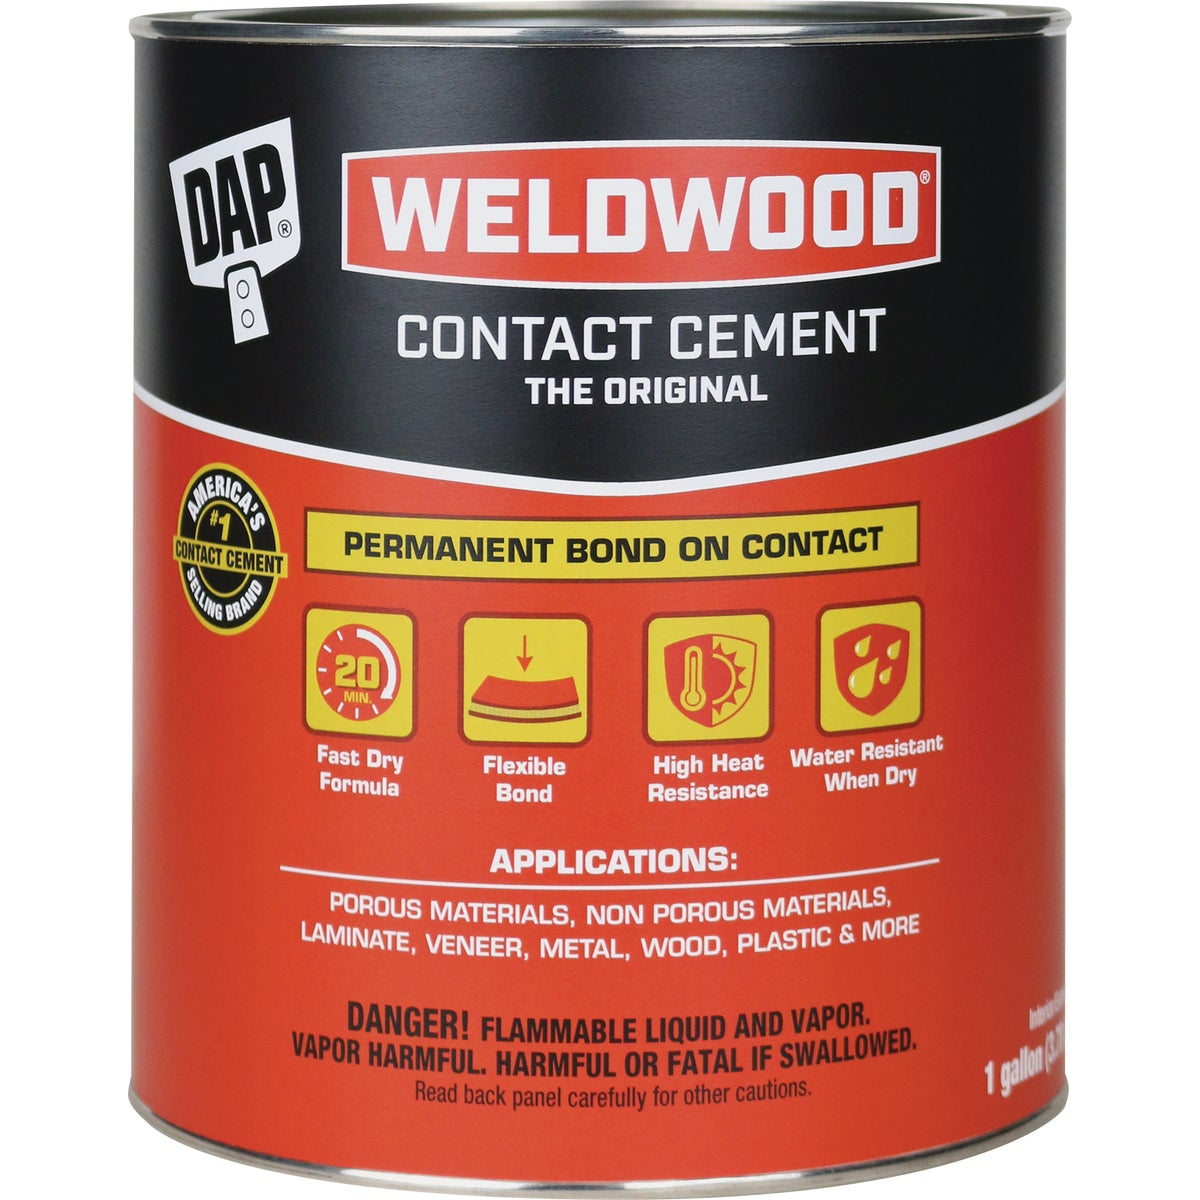 Original Contact Cement Gal. Weldwood Contact Cement